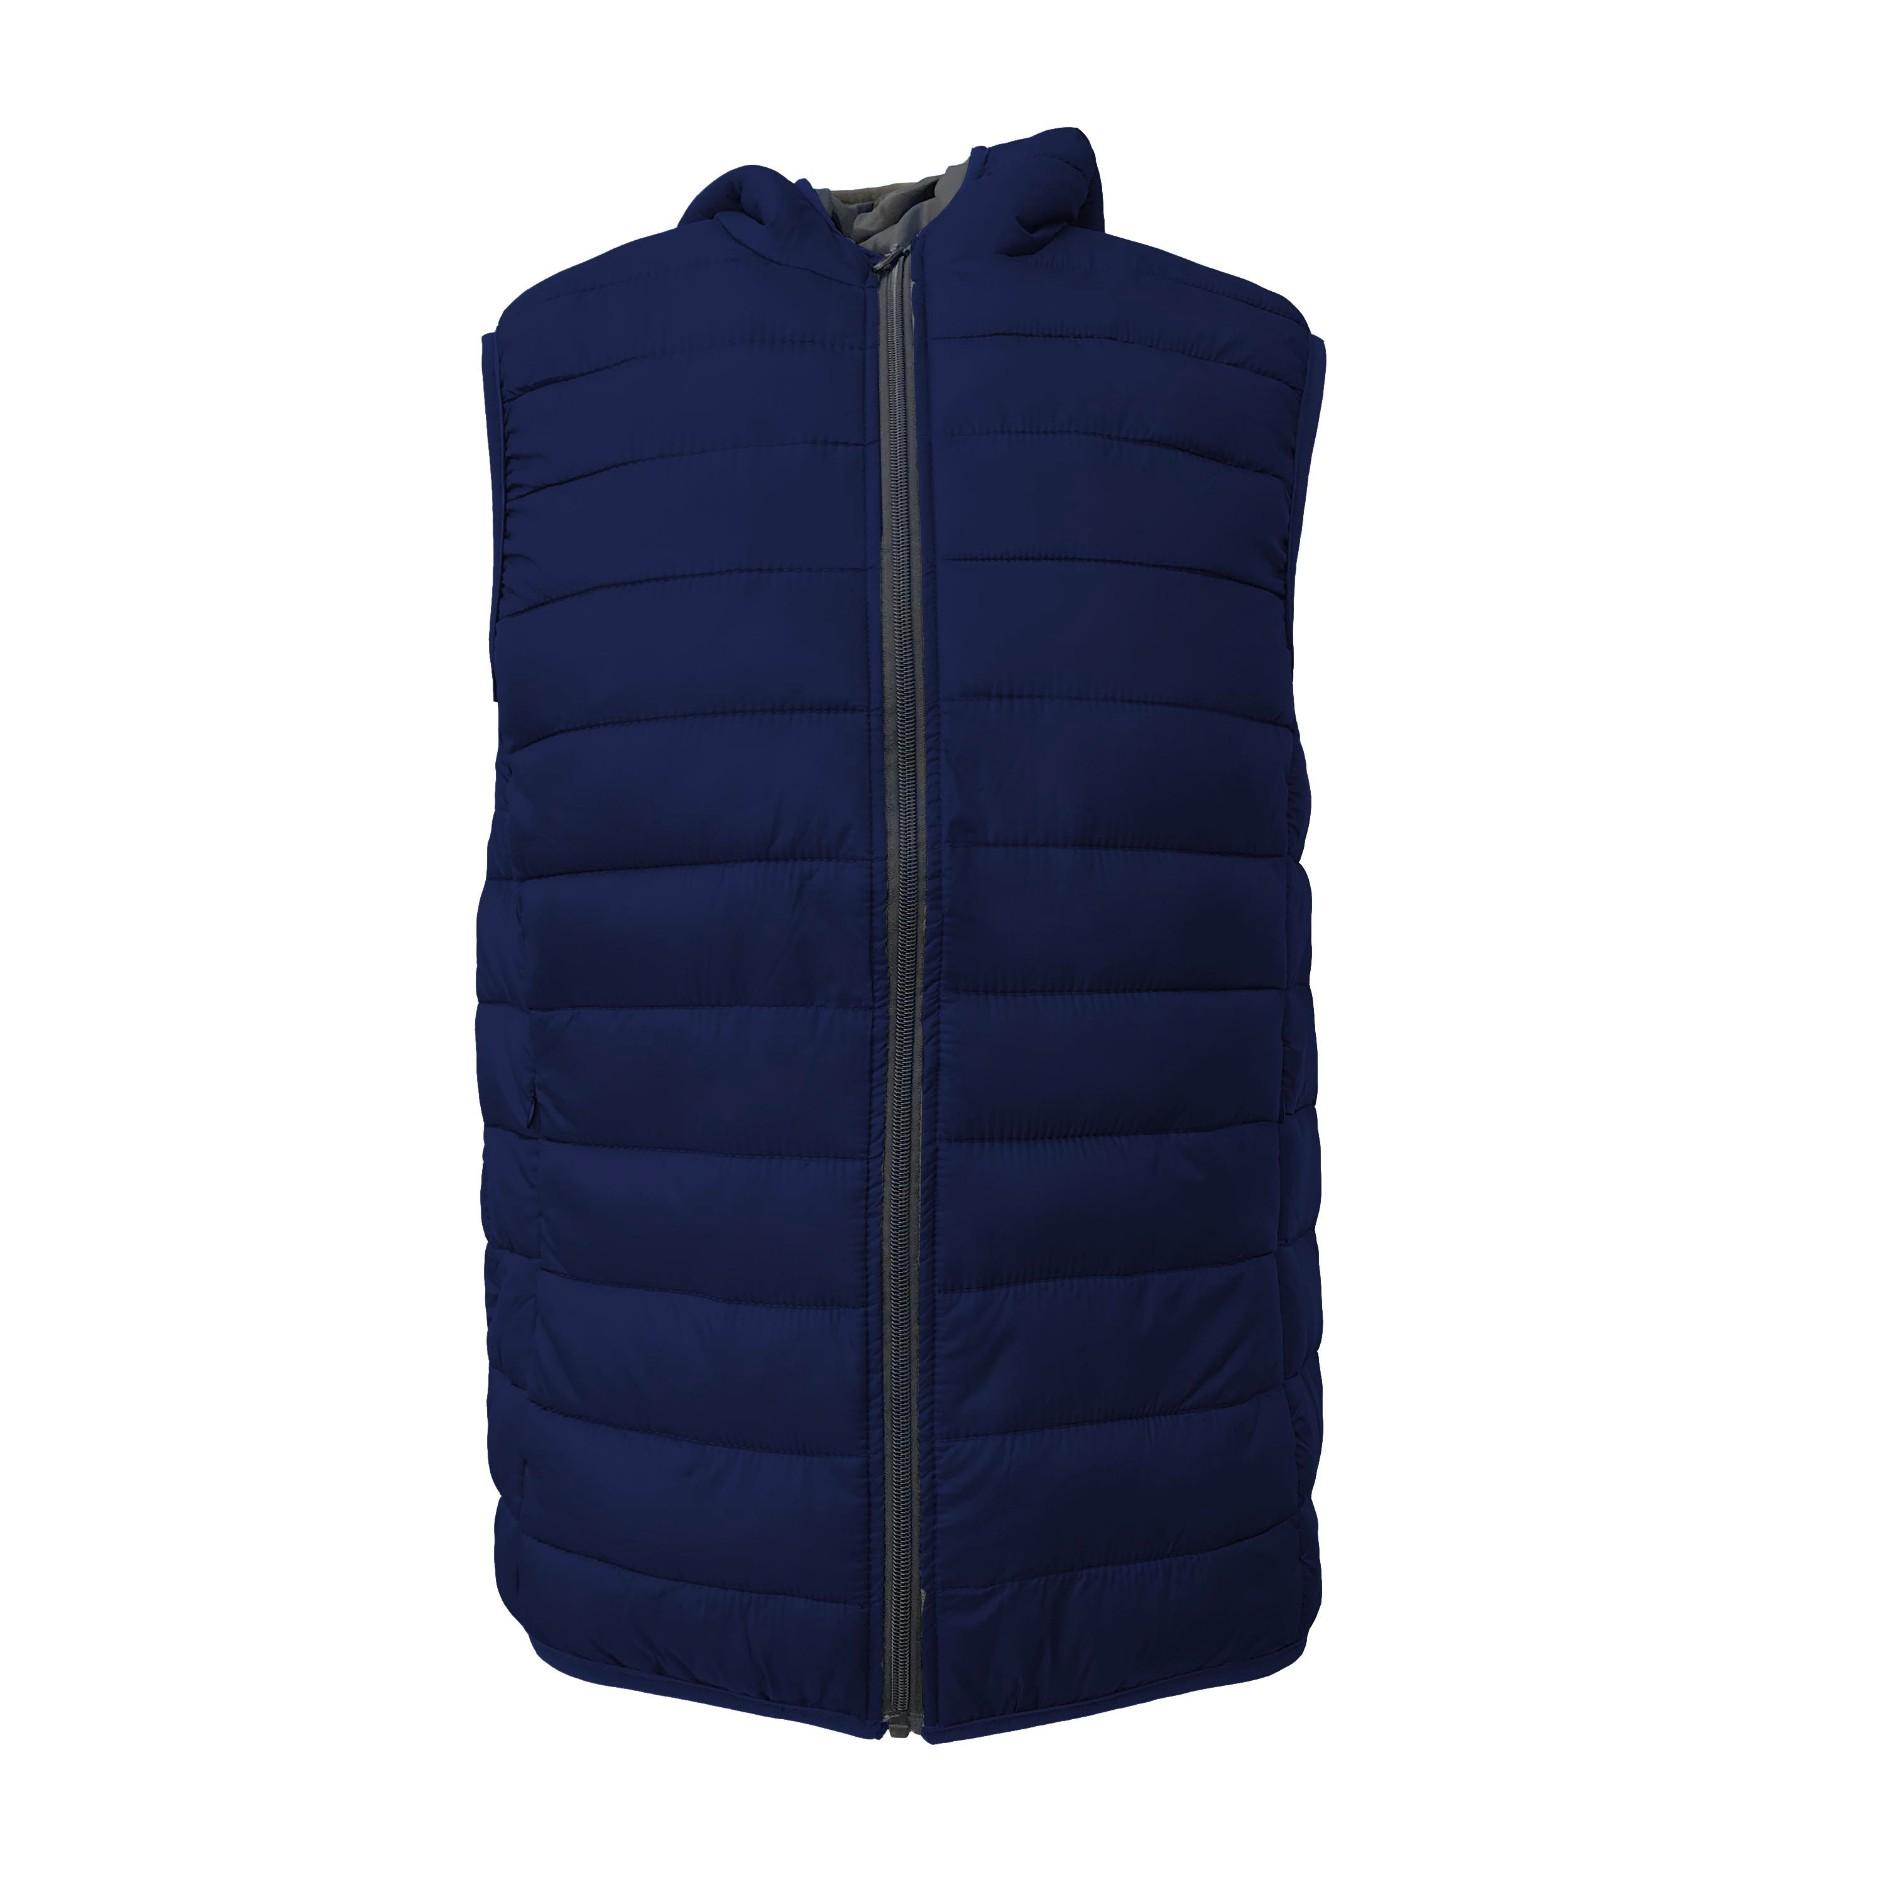 Men's Sleeveless Jackets Winter Padded hooded Vest Manufacturers, Men's Sleeveless Jackets Winter Padded hooded Vest Factory, Supply Men's Sleeveless Jackets Winter Padded hooded Vest